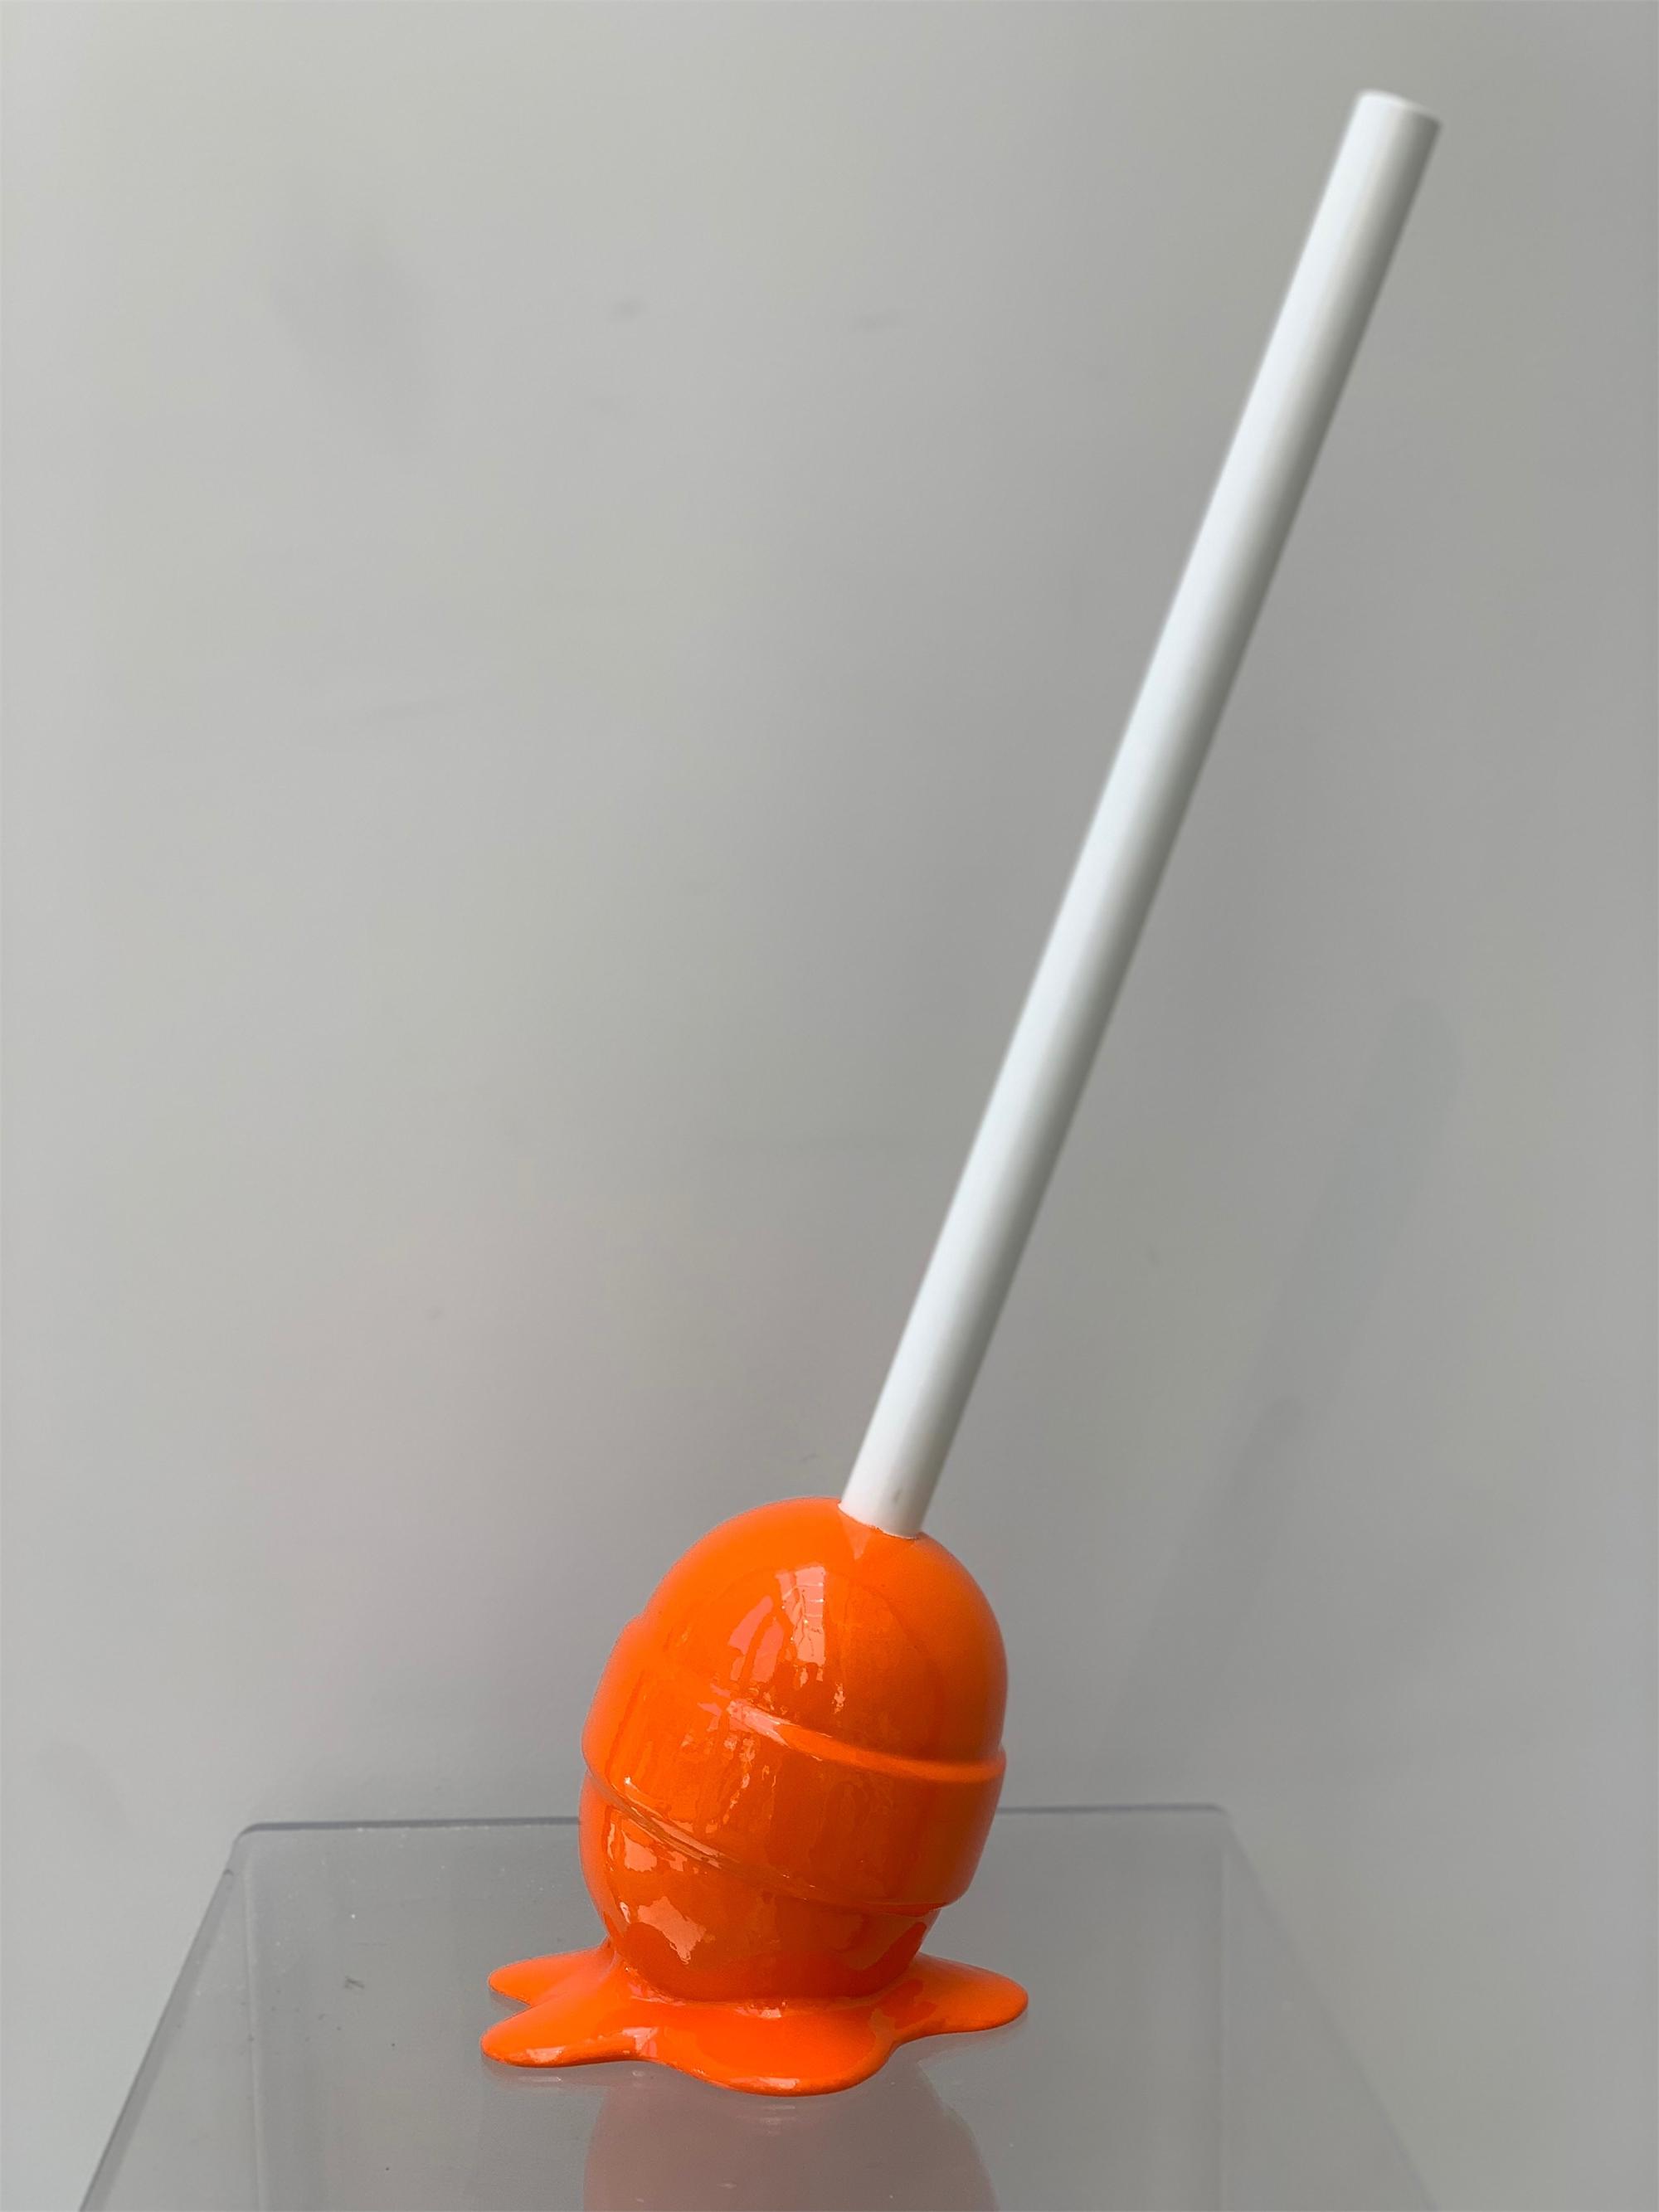 The Sweet Life Small Orange lollipop by Elena Bulatova